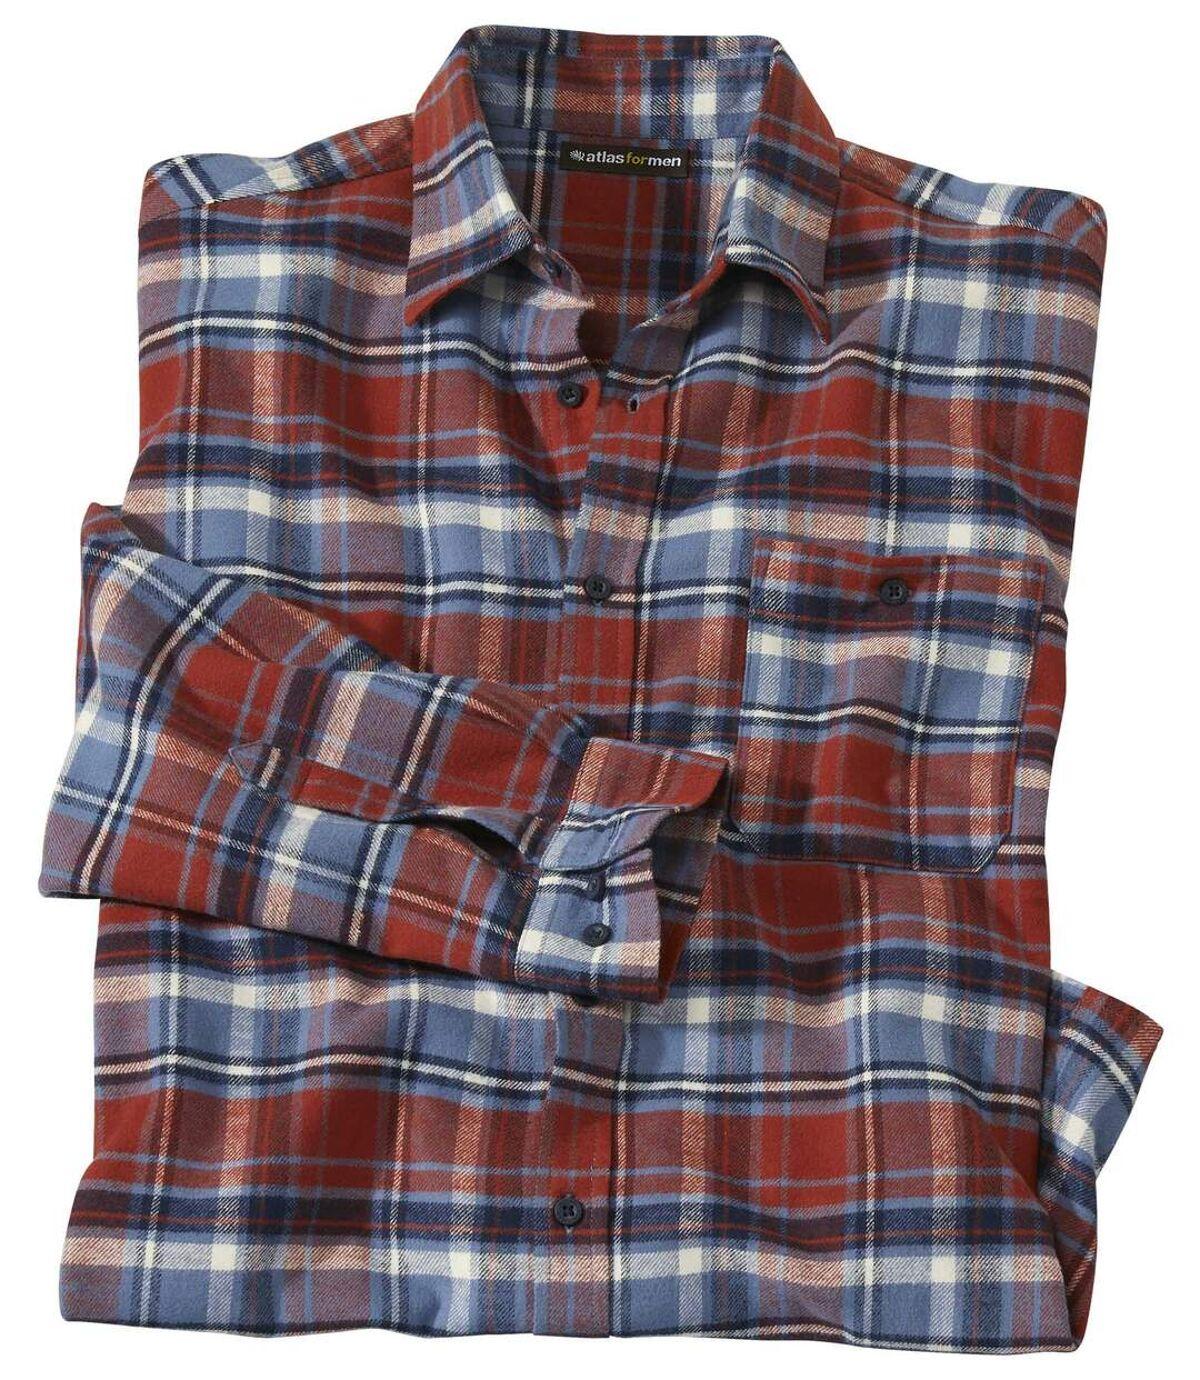 Men's Classic Checked Flannel Shirt - Red Navy Atlas For Men